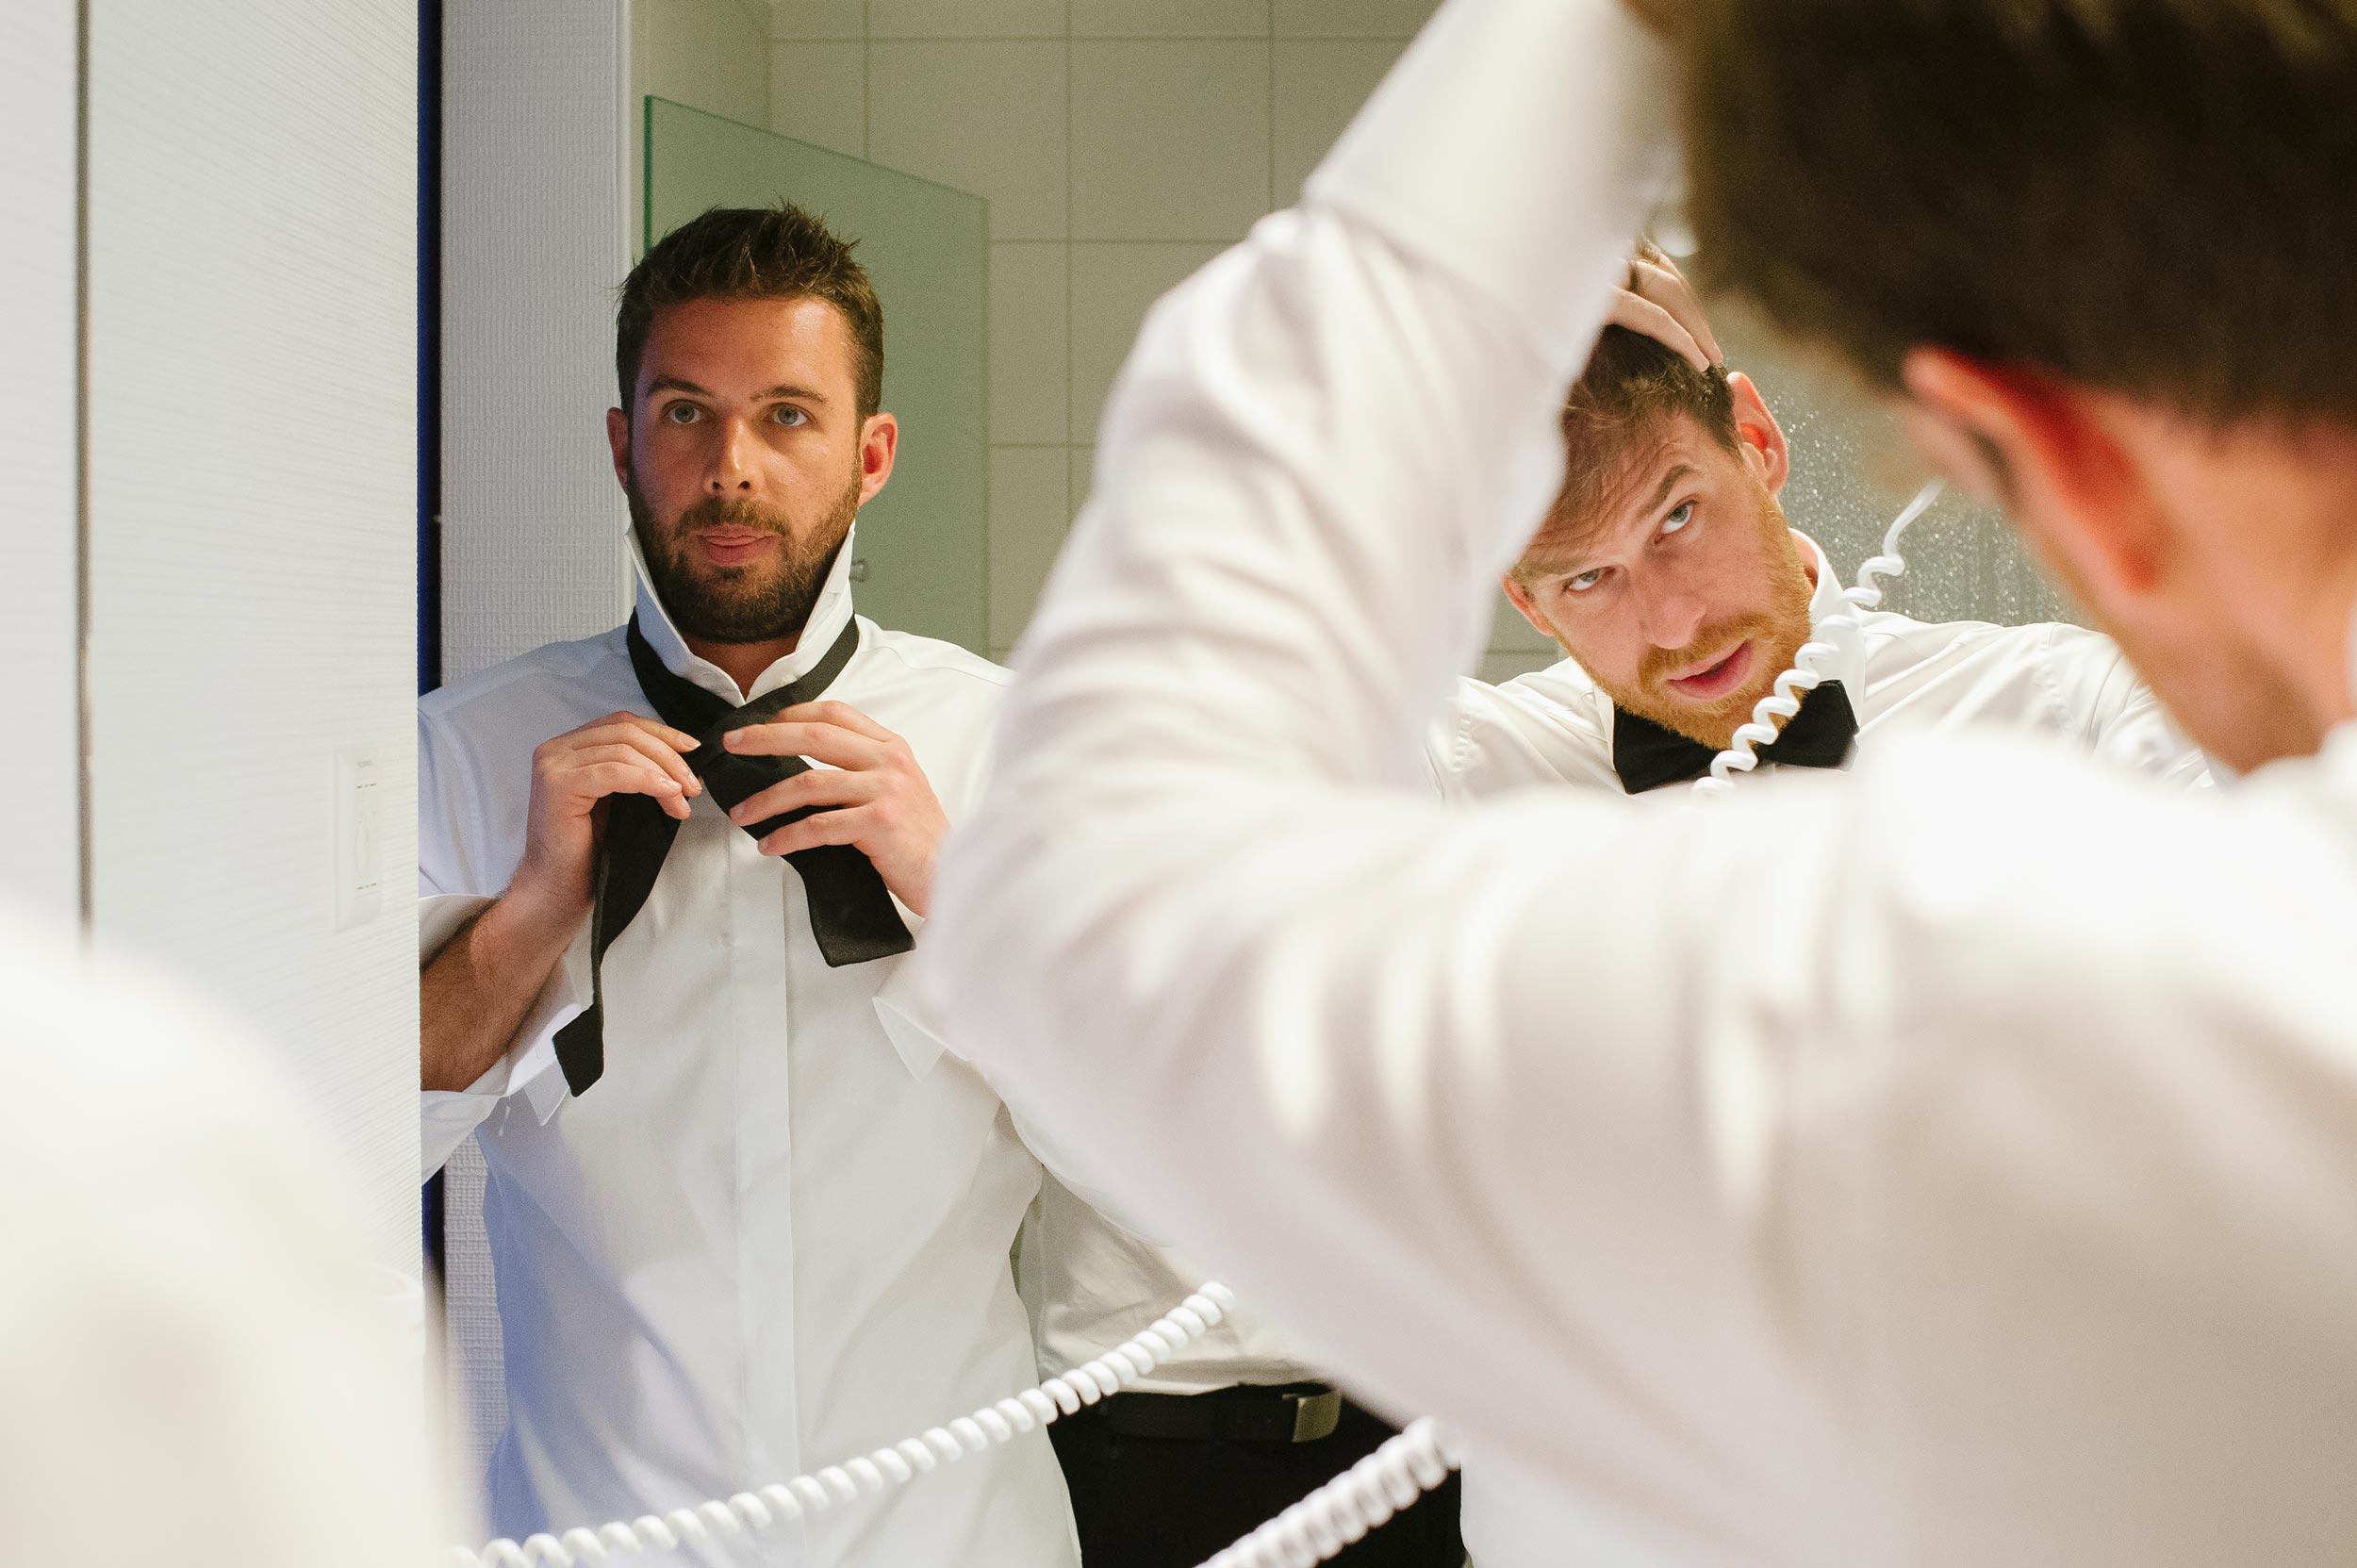 groom-getting-ready-drying-hair-wedding-ascona-lake-maggiore-switzerland.jpg